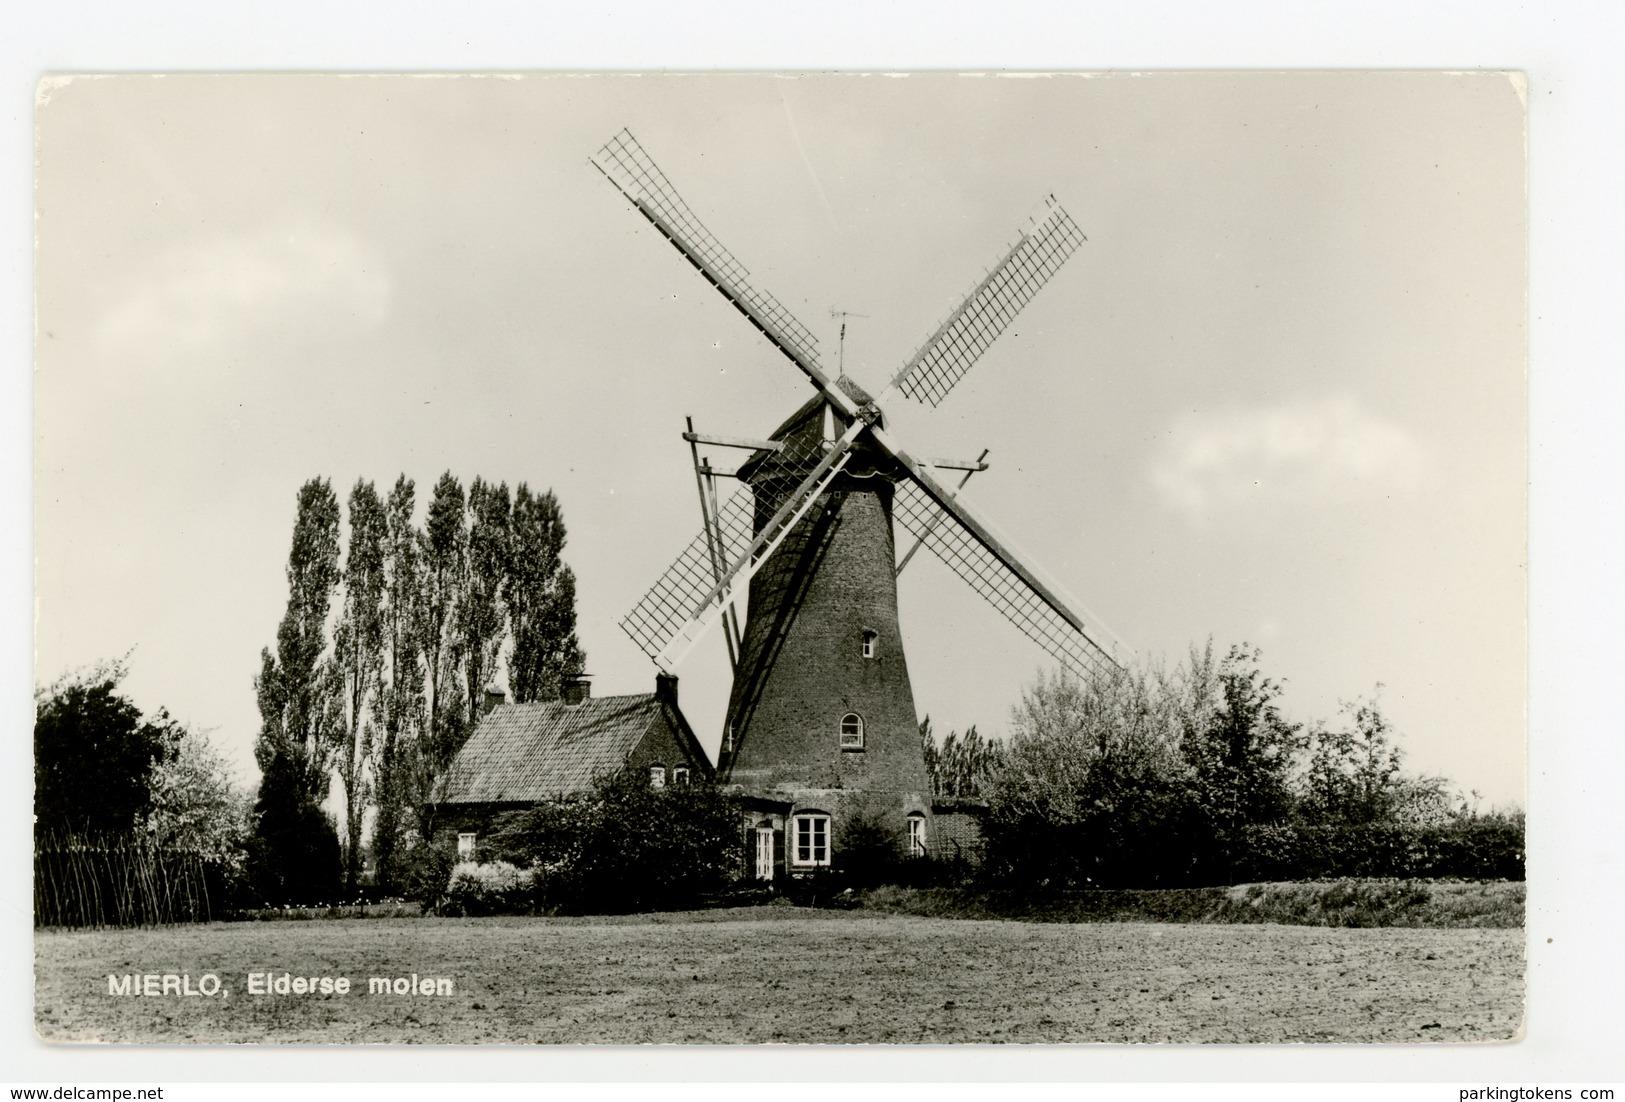 D118 - Mierlo Elderse Molen - Uitg V D Vleuten - Molen - Moulin - Mill - Mühle - Nederland